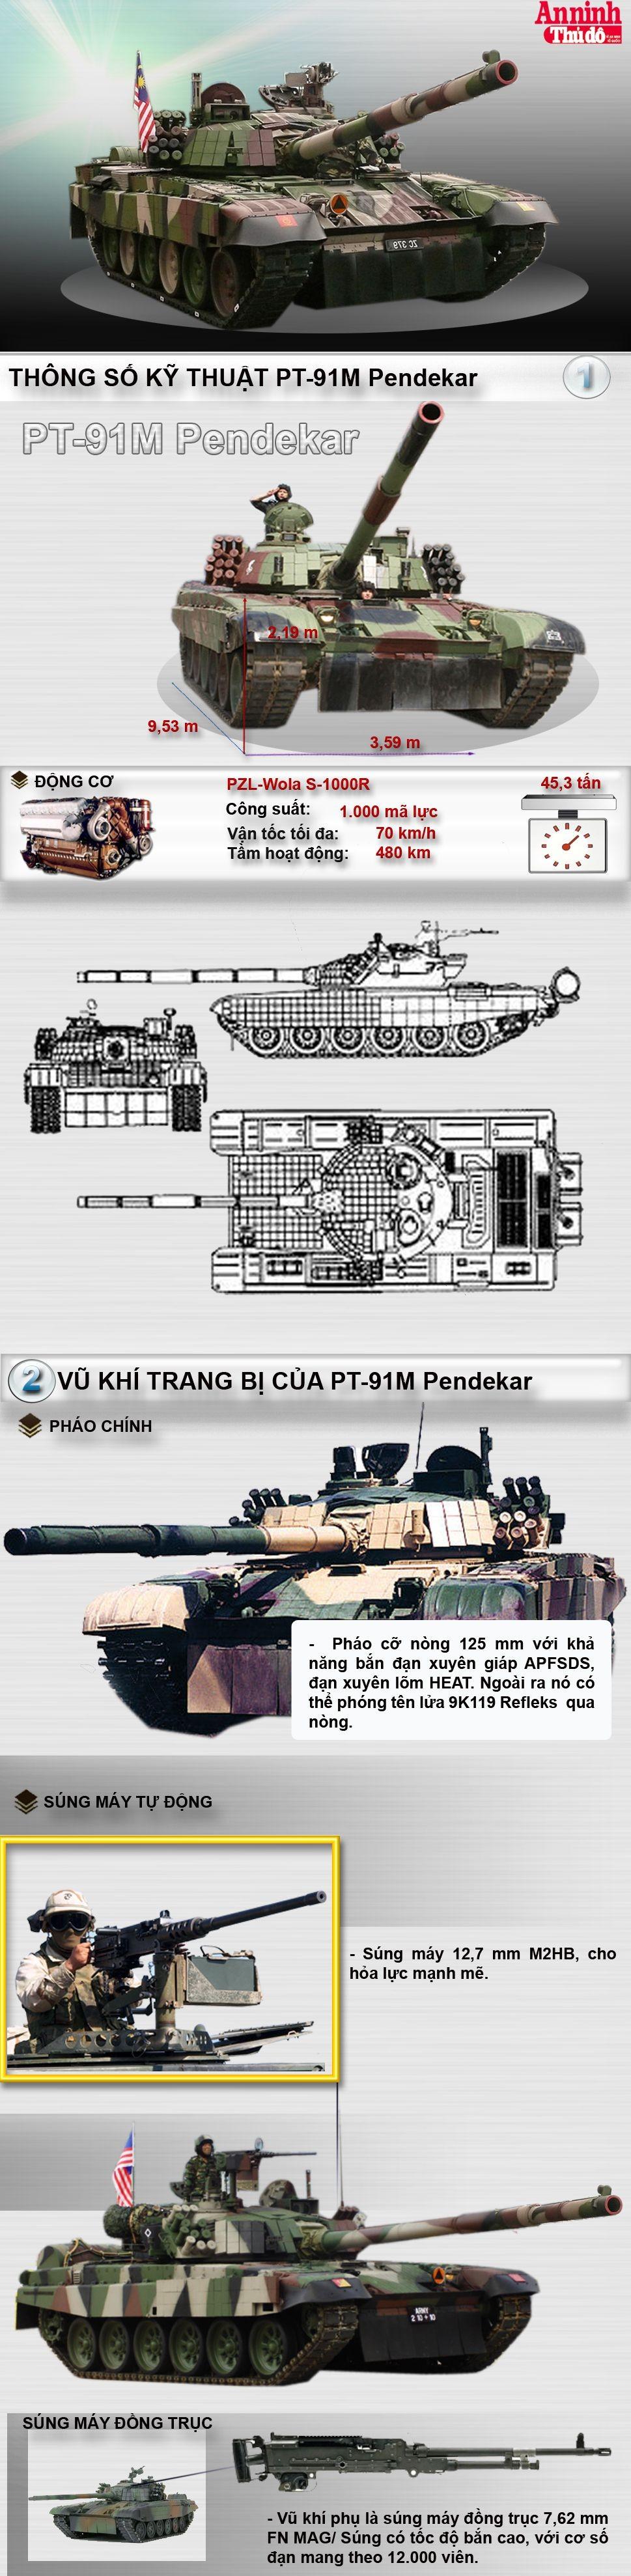 [Infographic] PT - 91M Pendekar - Vua tăng của lục quân Malaysia